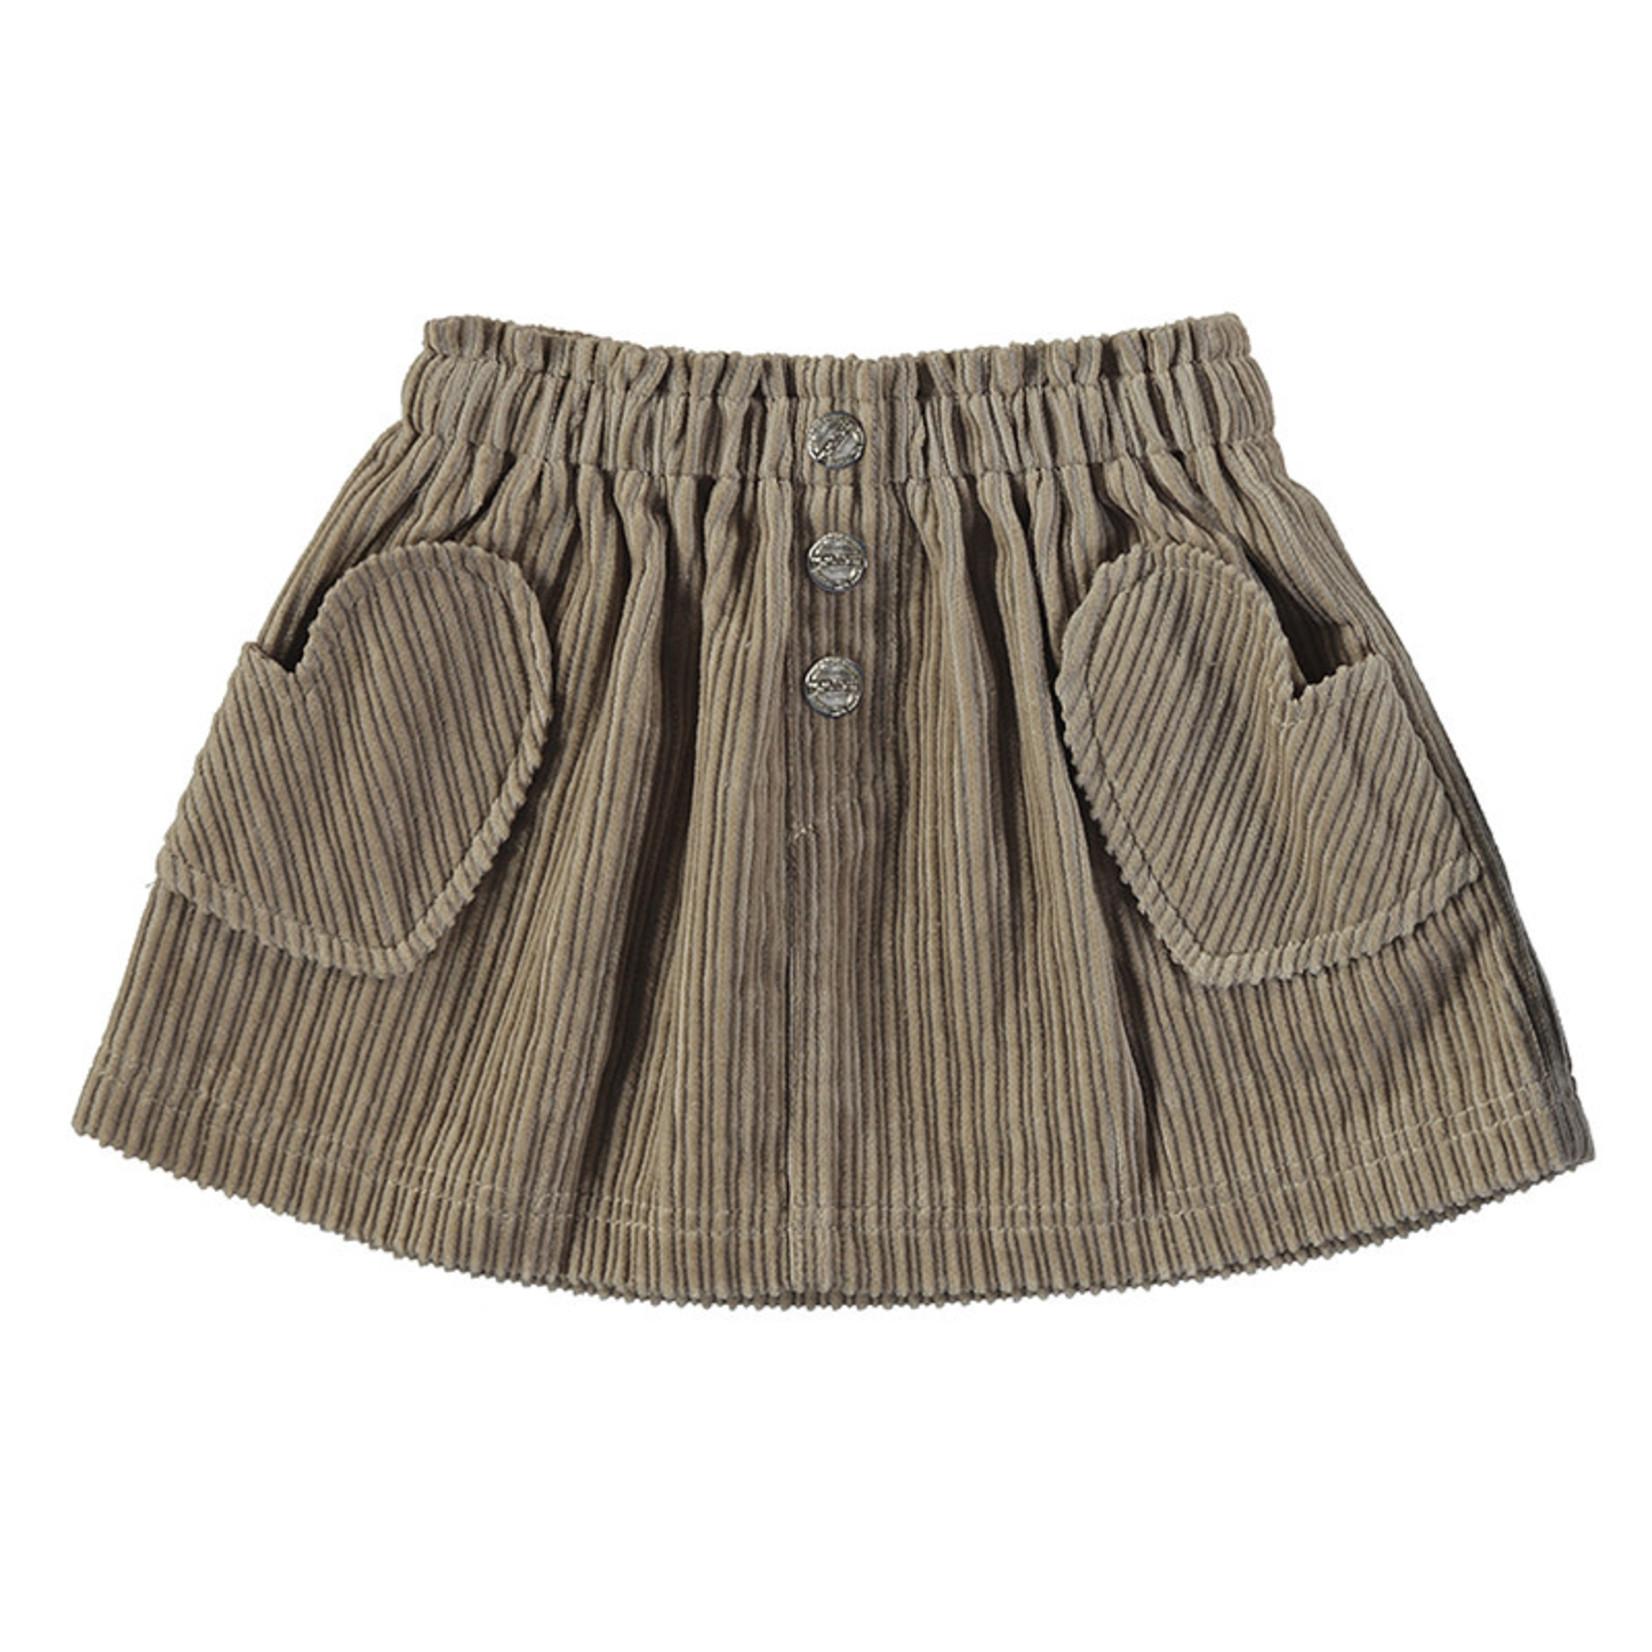 Corduroy skirt Kris - Mayoral